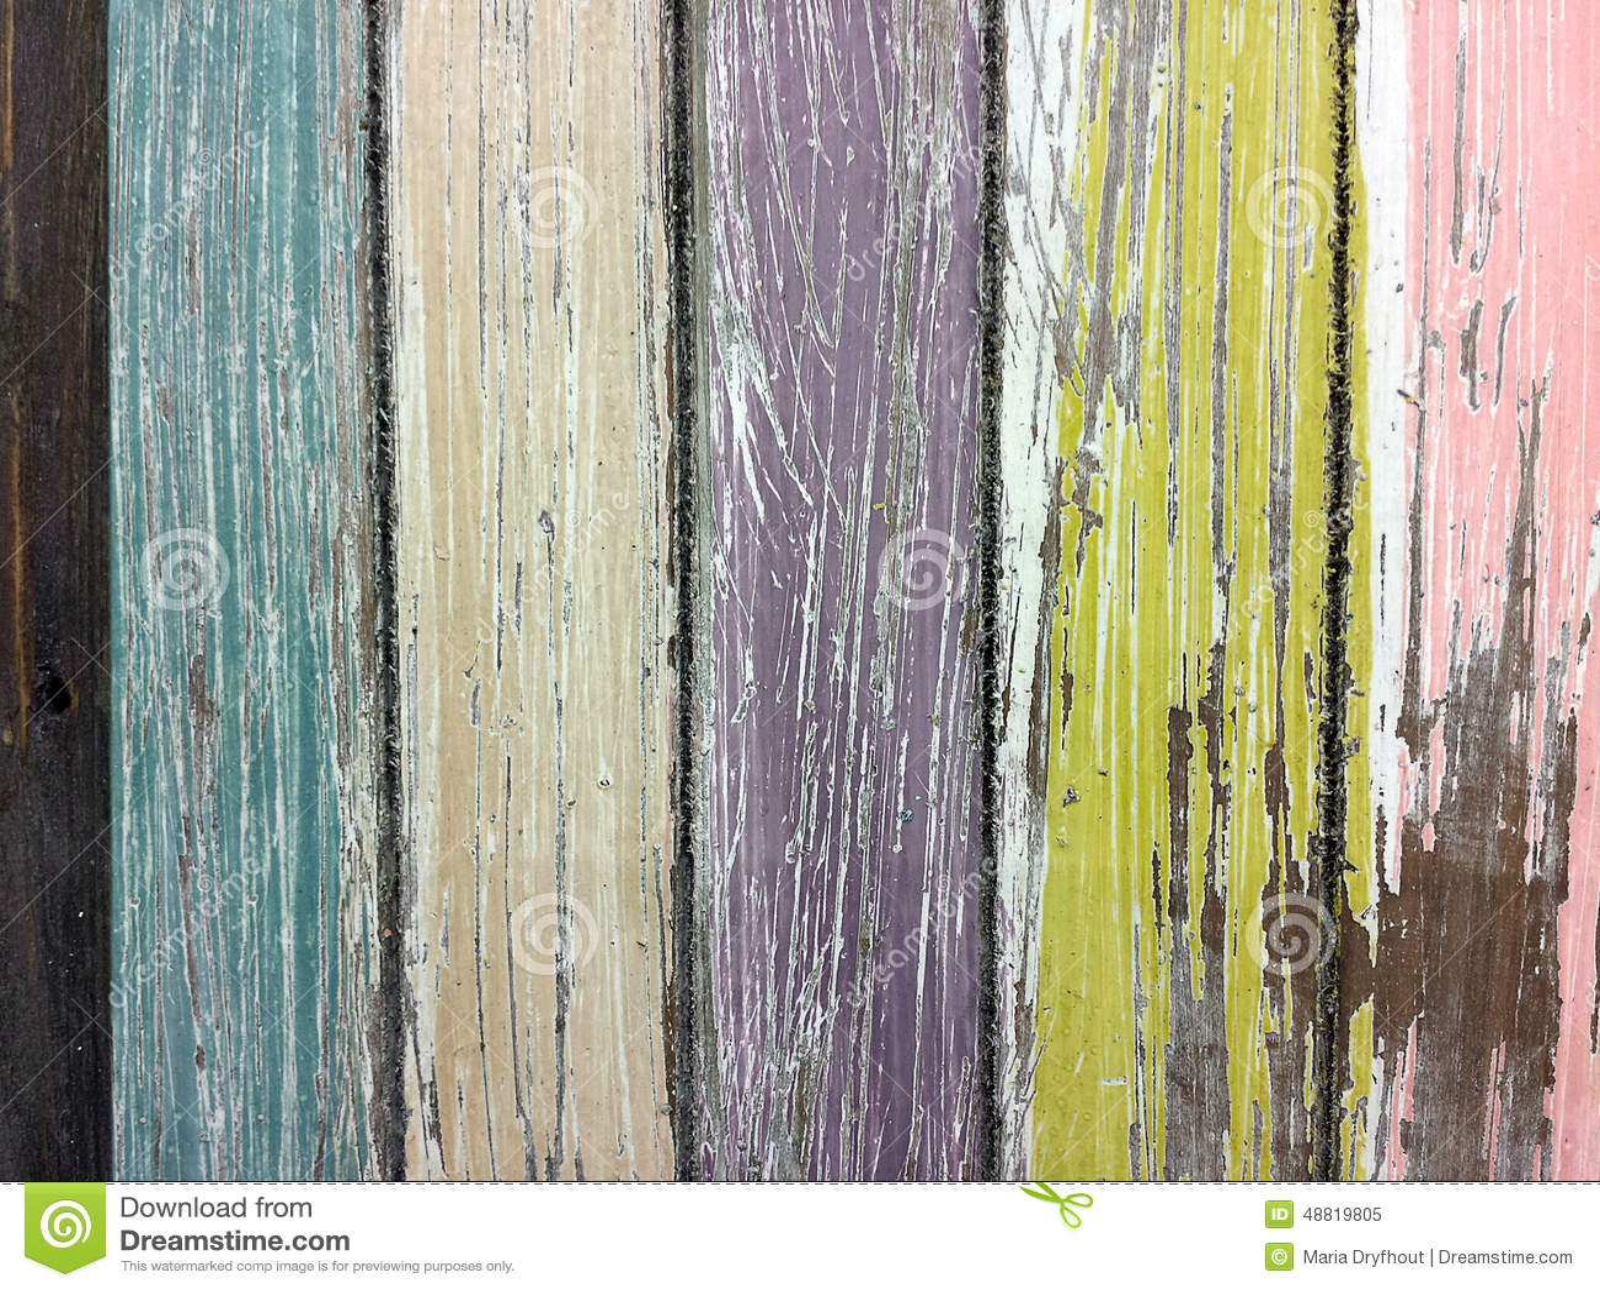 Faded Paint On Barn Wood Stock Photo Image 48819805